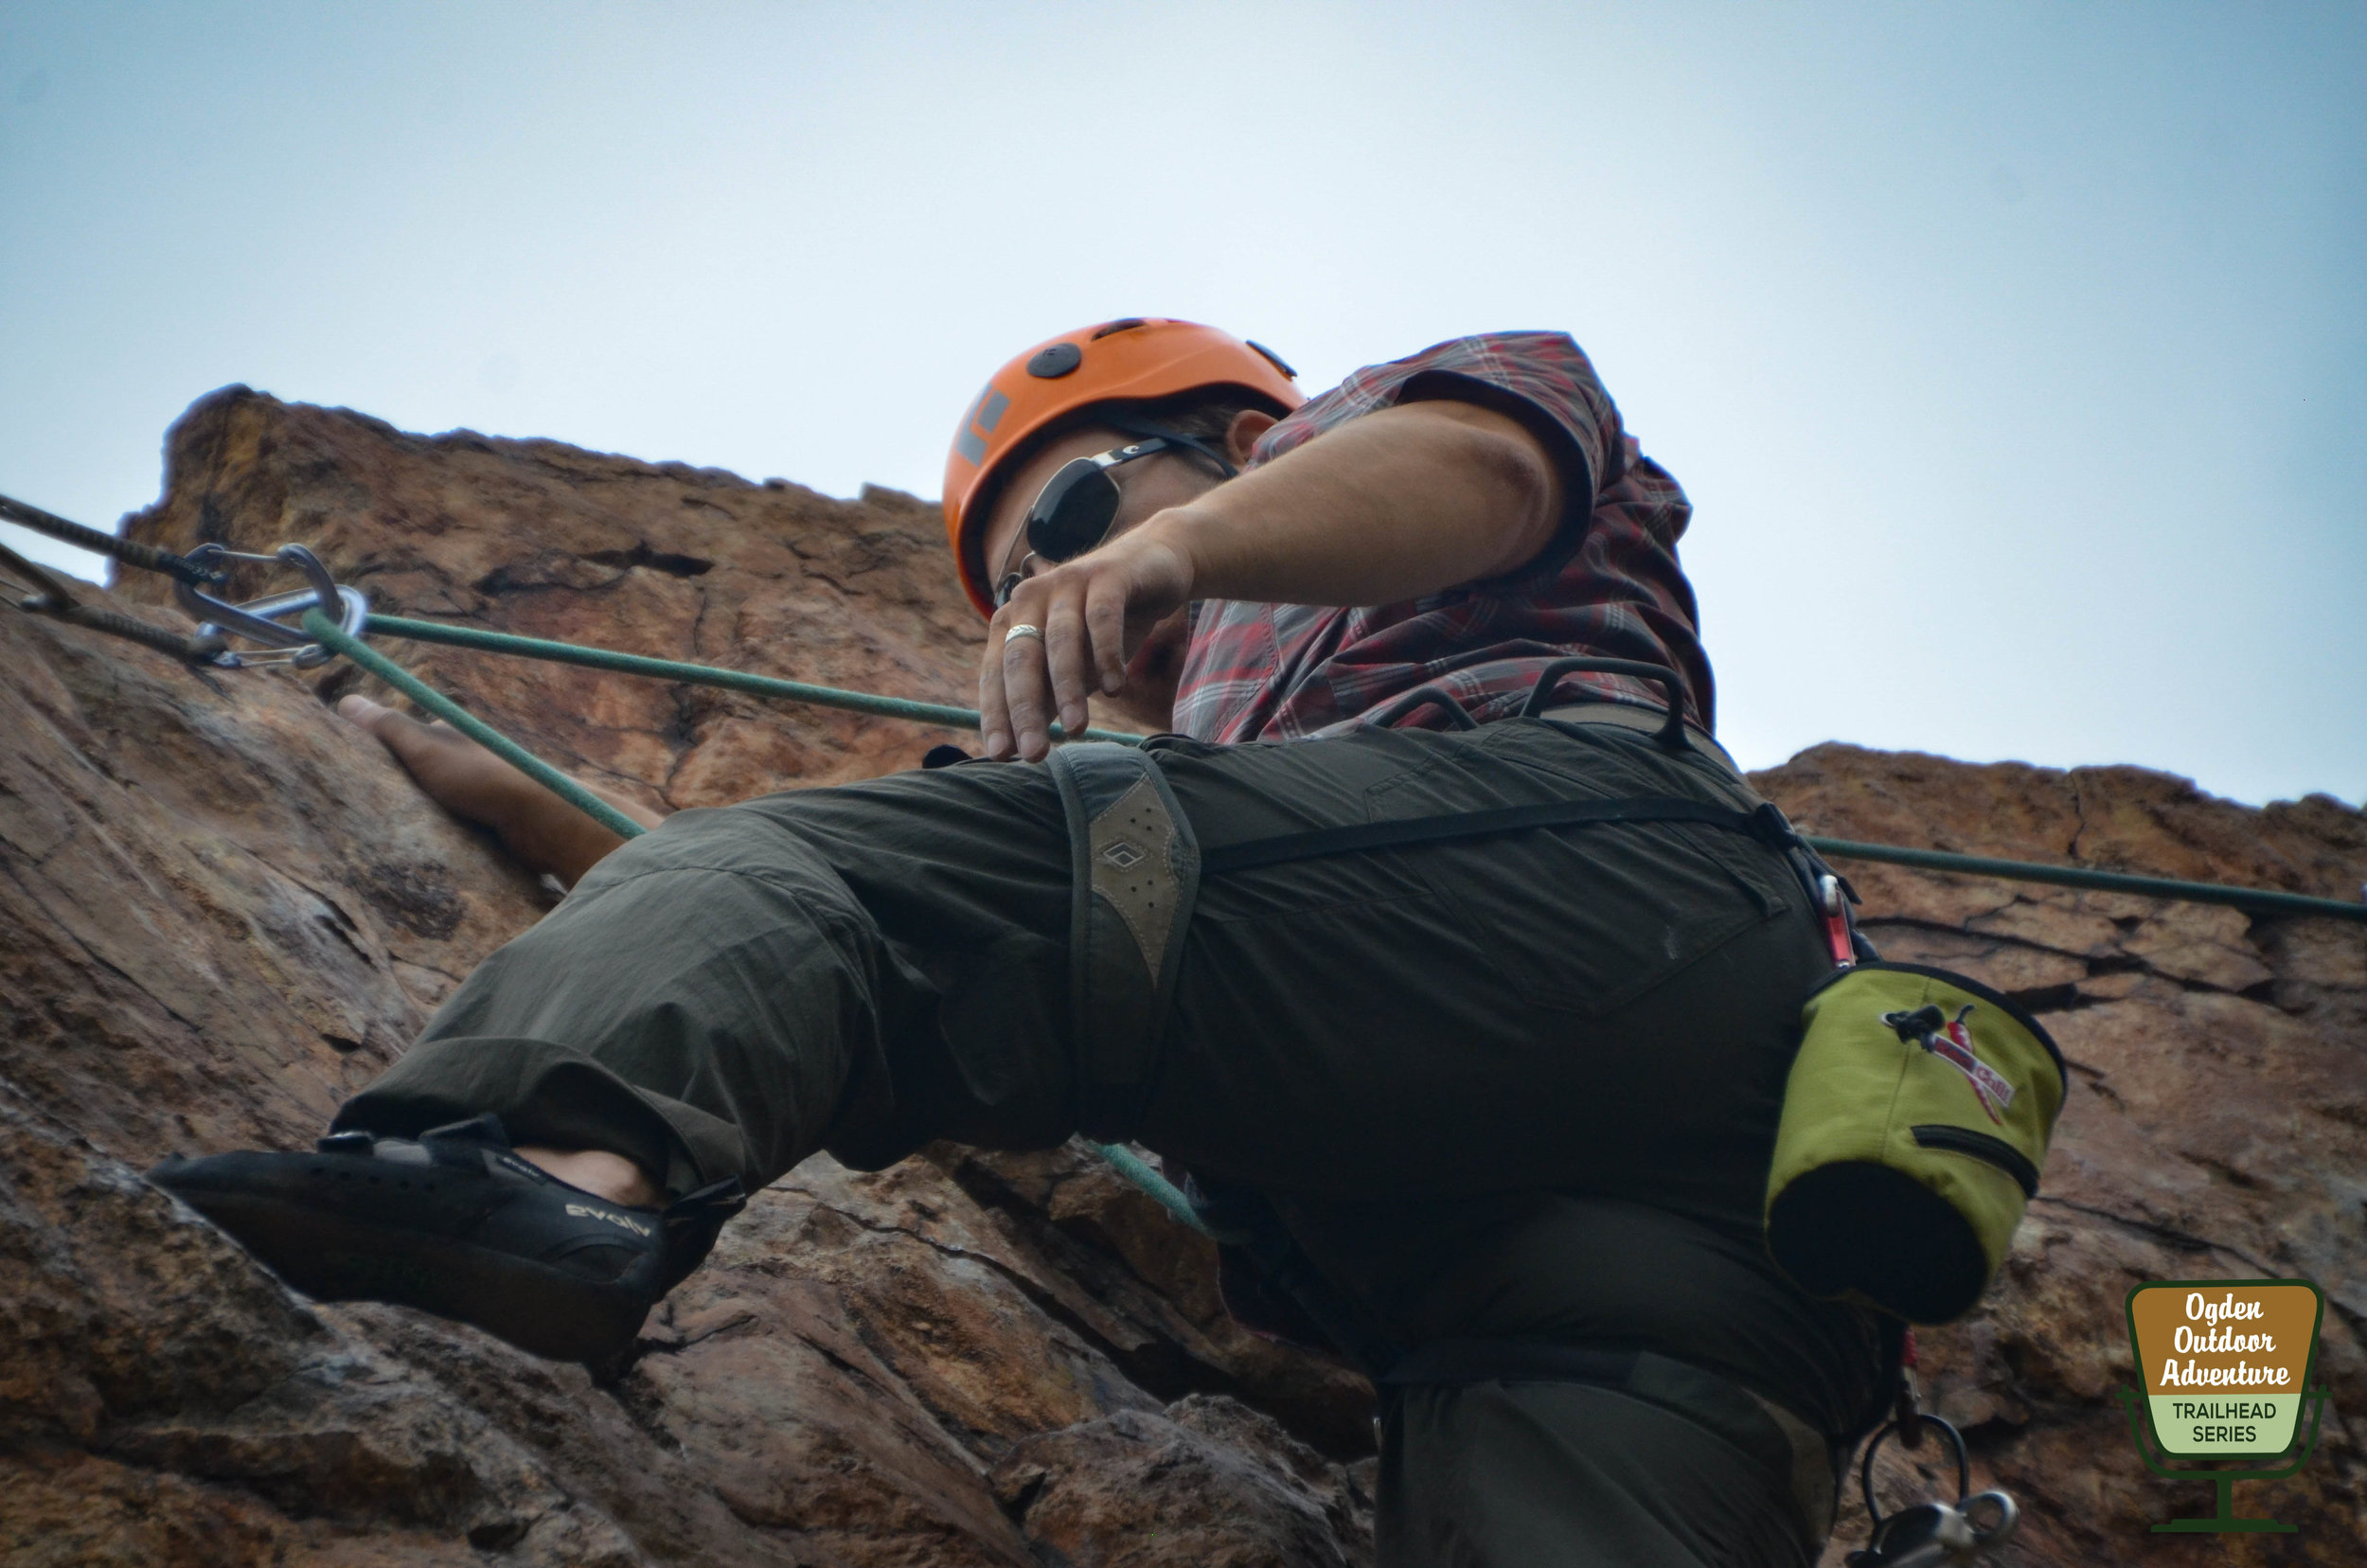 Ogden Outdoor Adventure Show 248 - Bear House Mountaineering-24.jpg